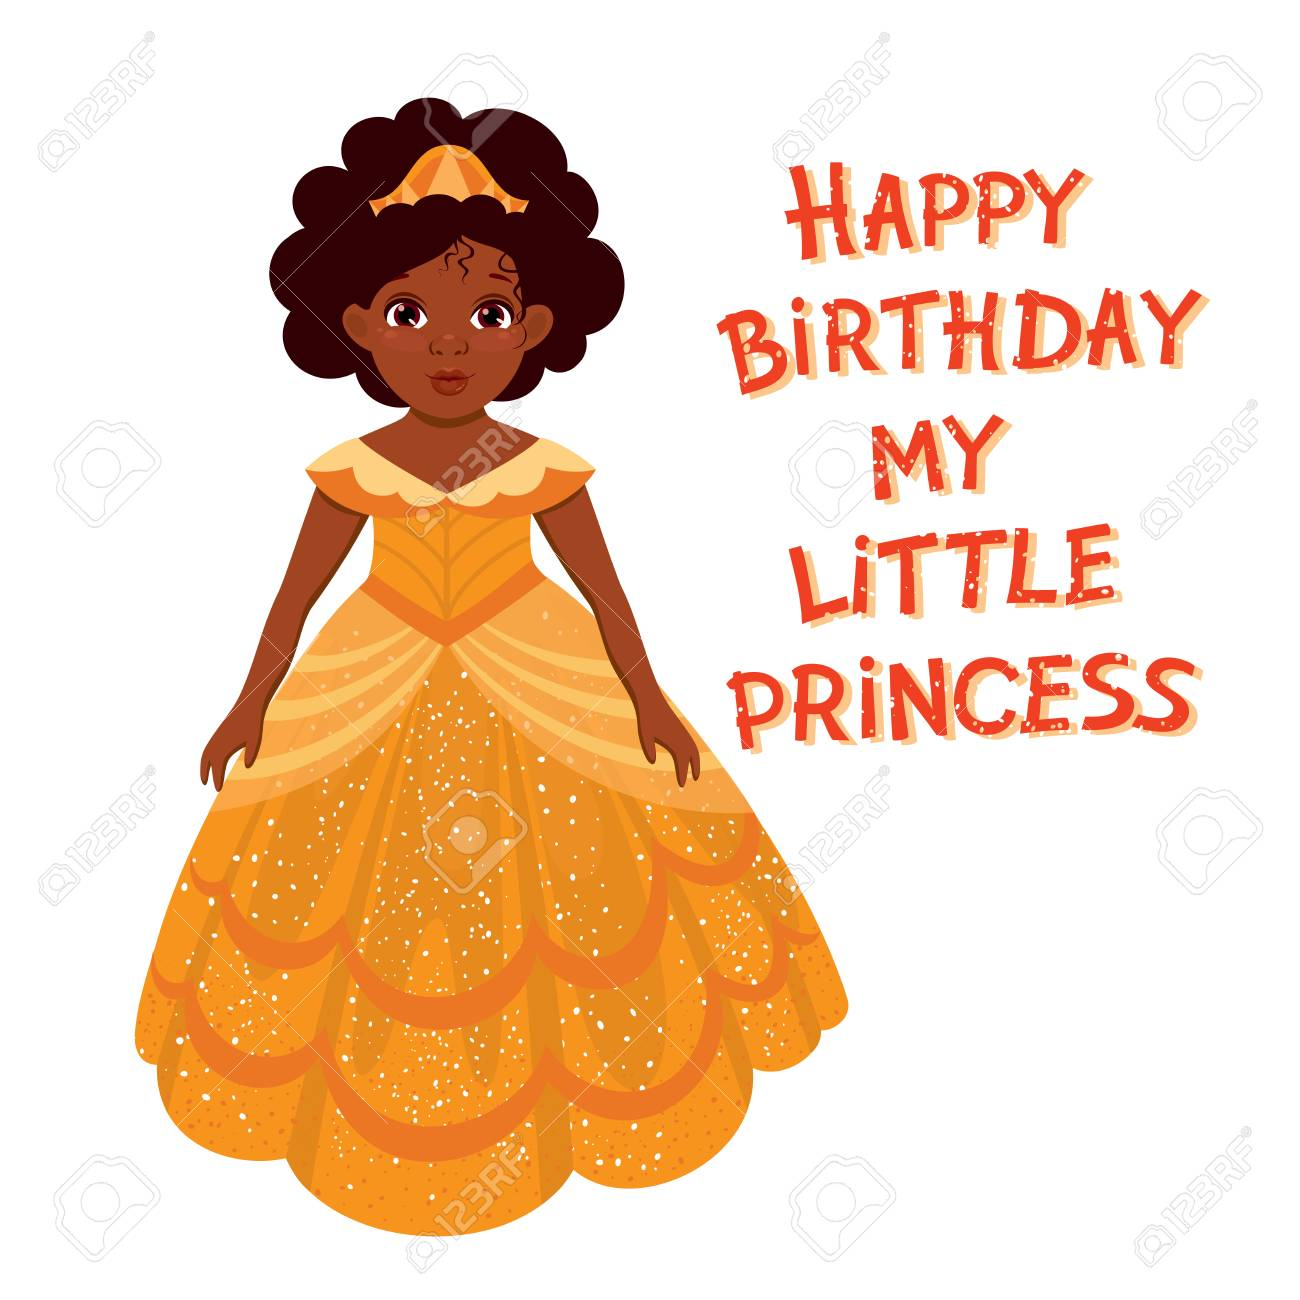 Happy birthday cute fairy girl with dark skin greeting card happy birthday cute fairy girl with dark skin greeting card with colorful balloon and hand kristyandbryce Images